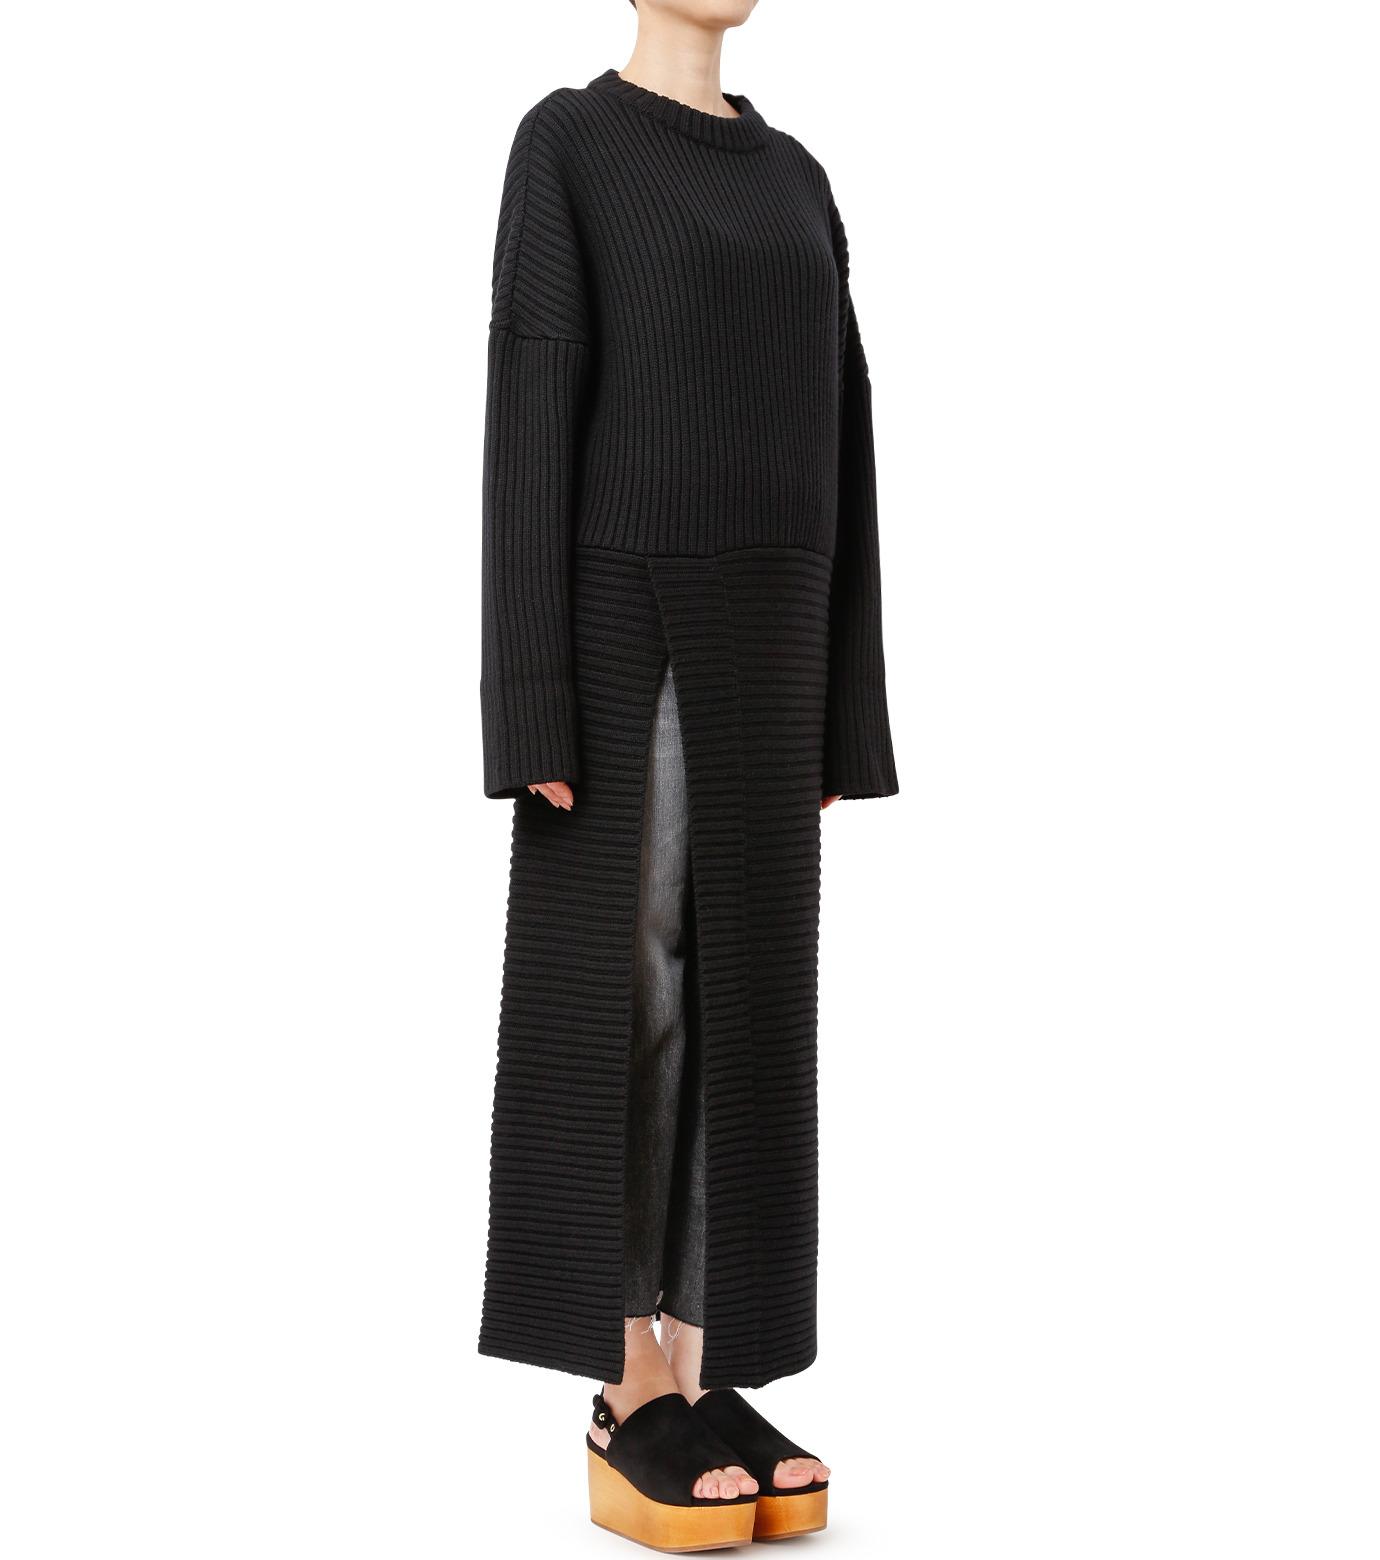 CHRISTIAN DADA(クリスチャン ダダ)のMaxi Knit Dress w/Slit-BLACK(ニット/knit)-16W-D-0806-13 拡大詳細画像2